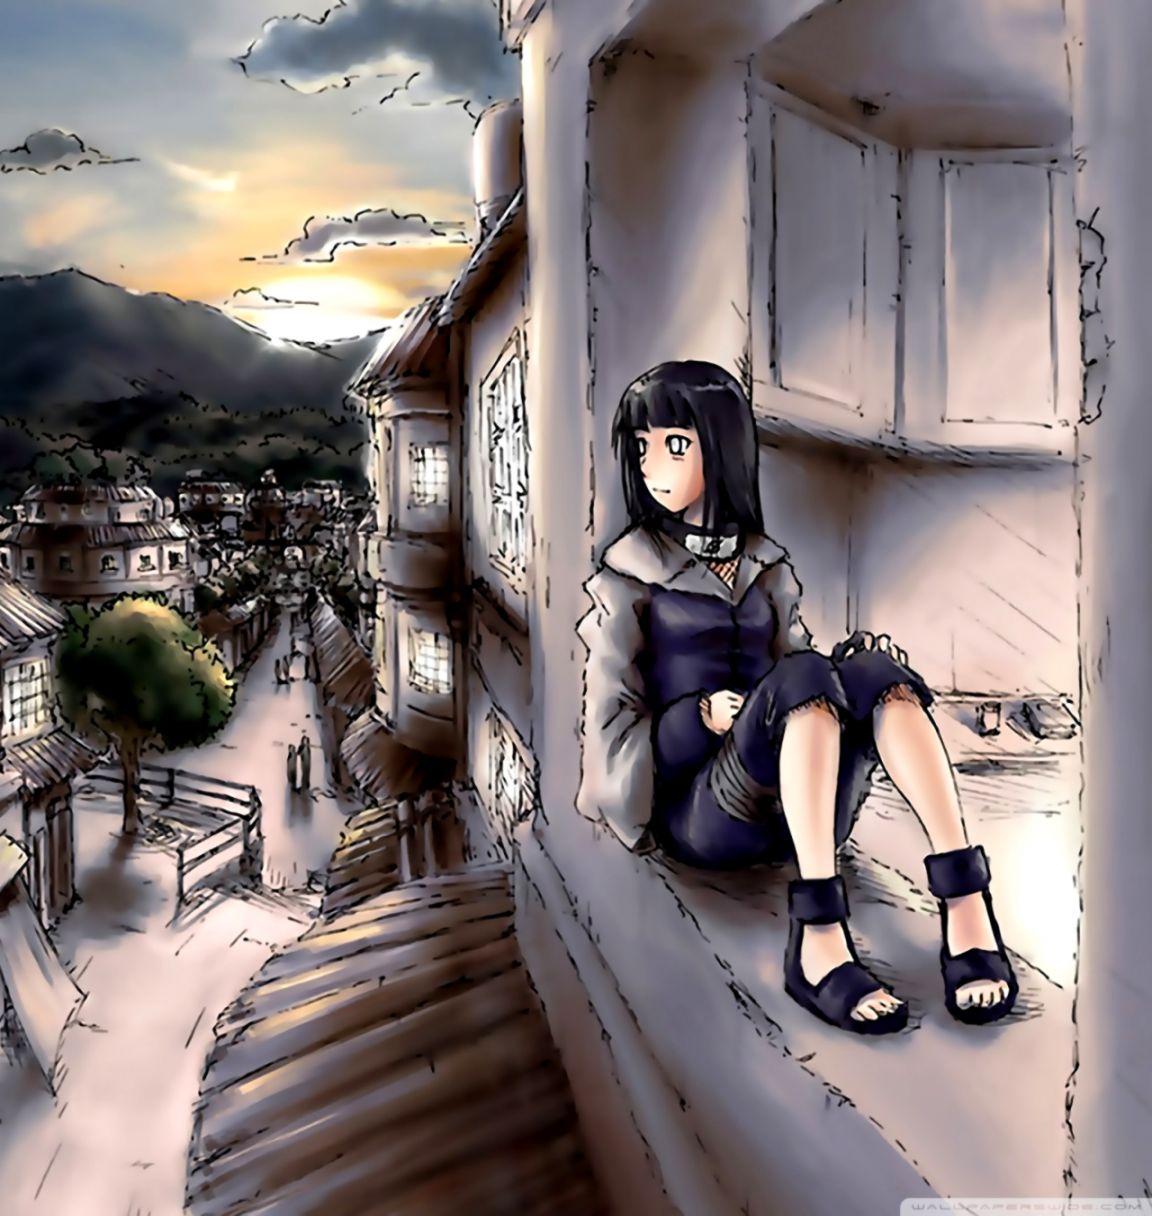 Anime Naruto Hinata Wallpaper Hd Desktop Dom Wallpapers